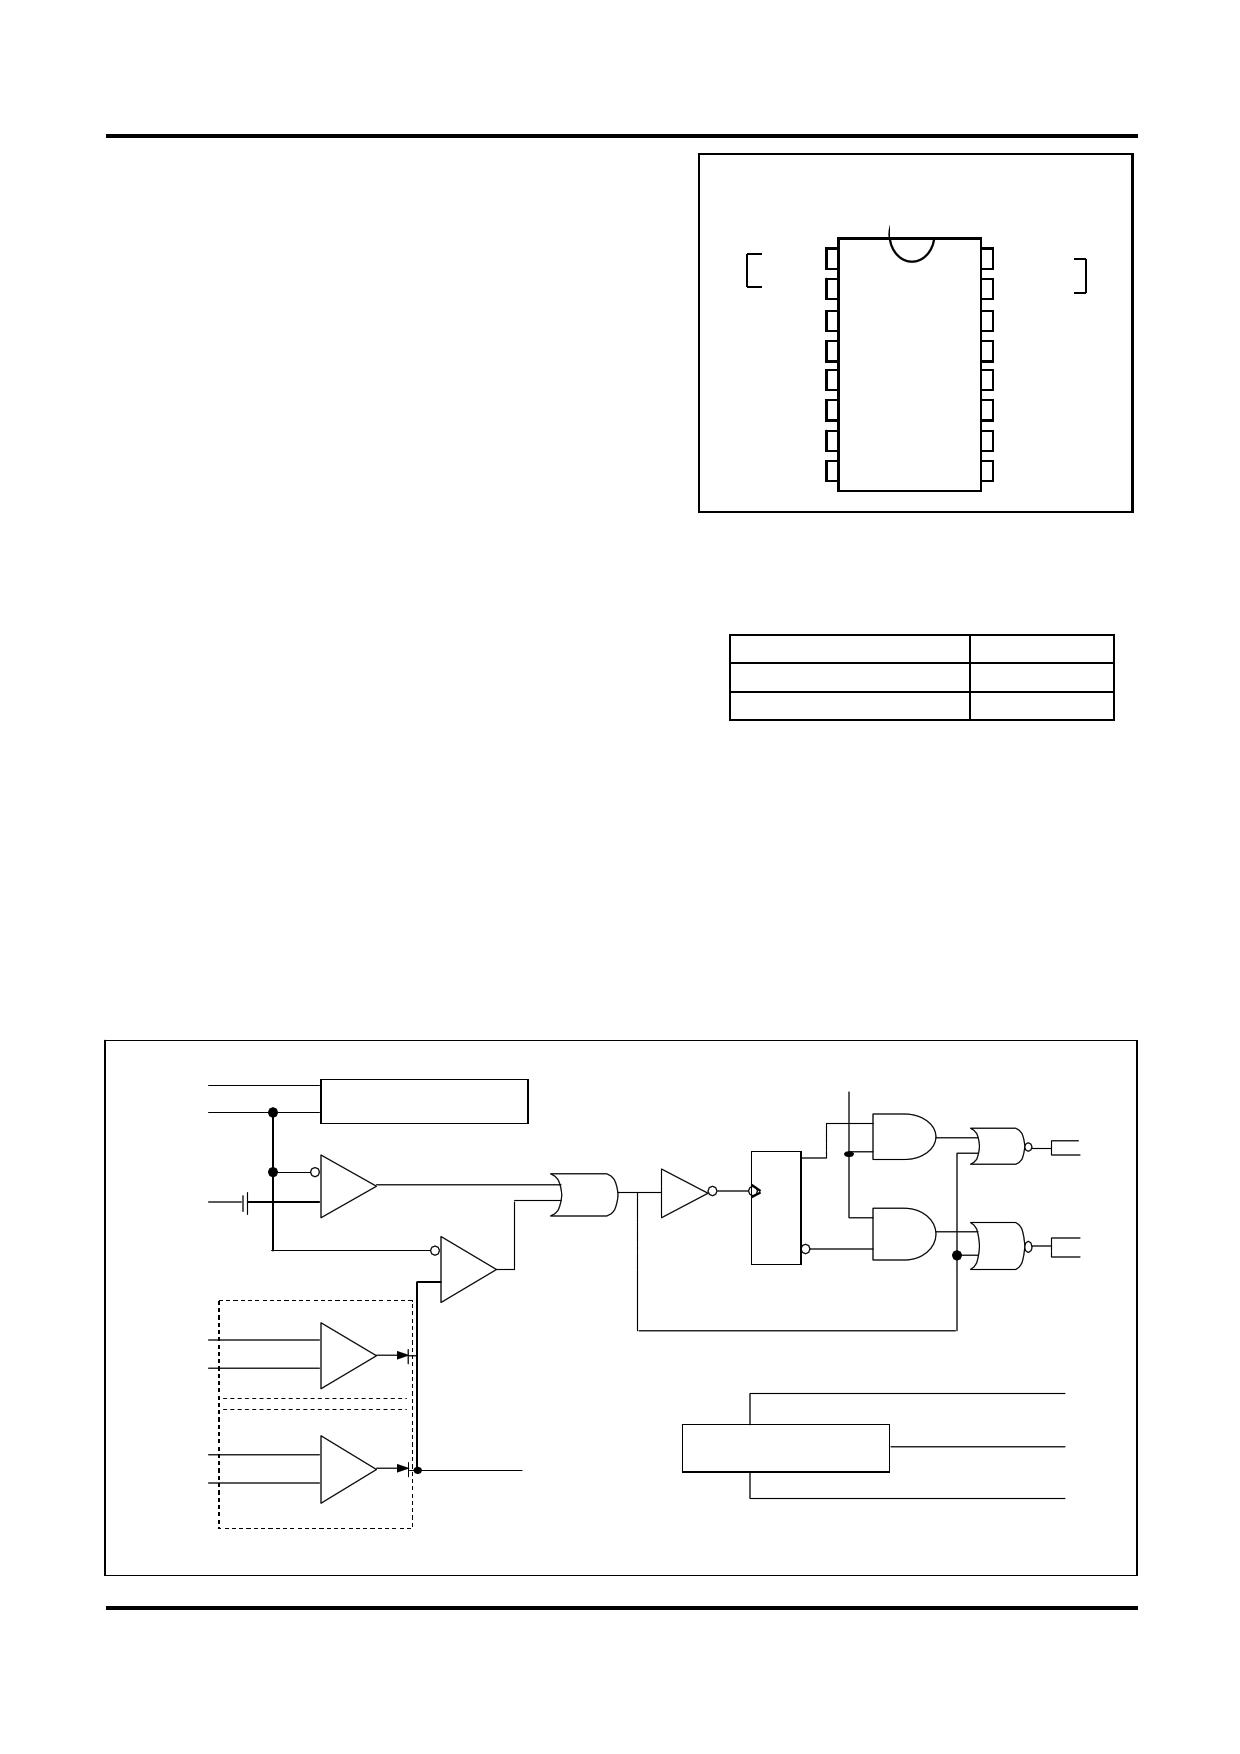 TL494D datasheet